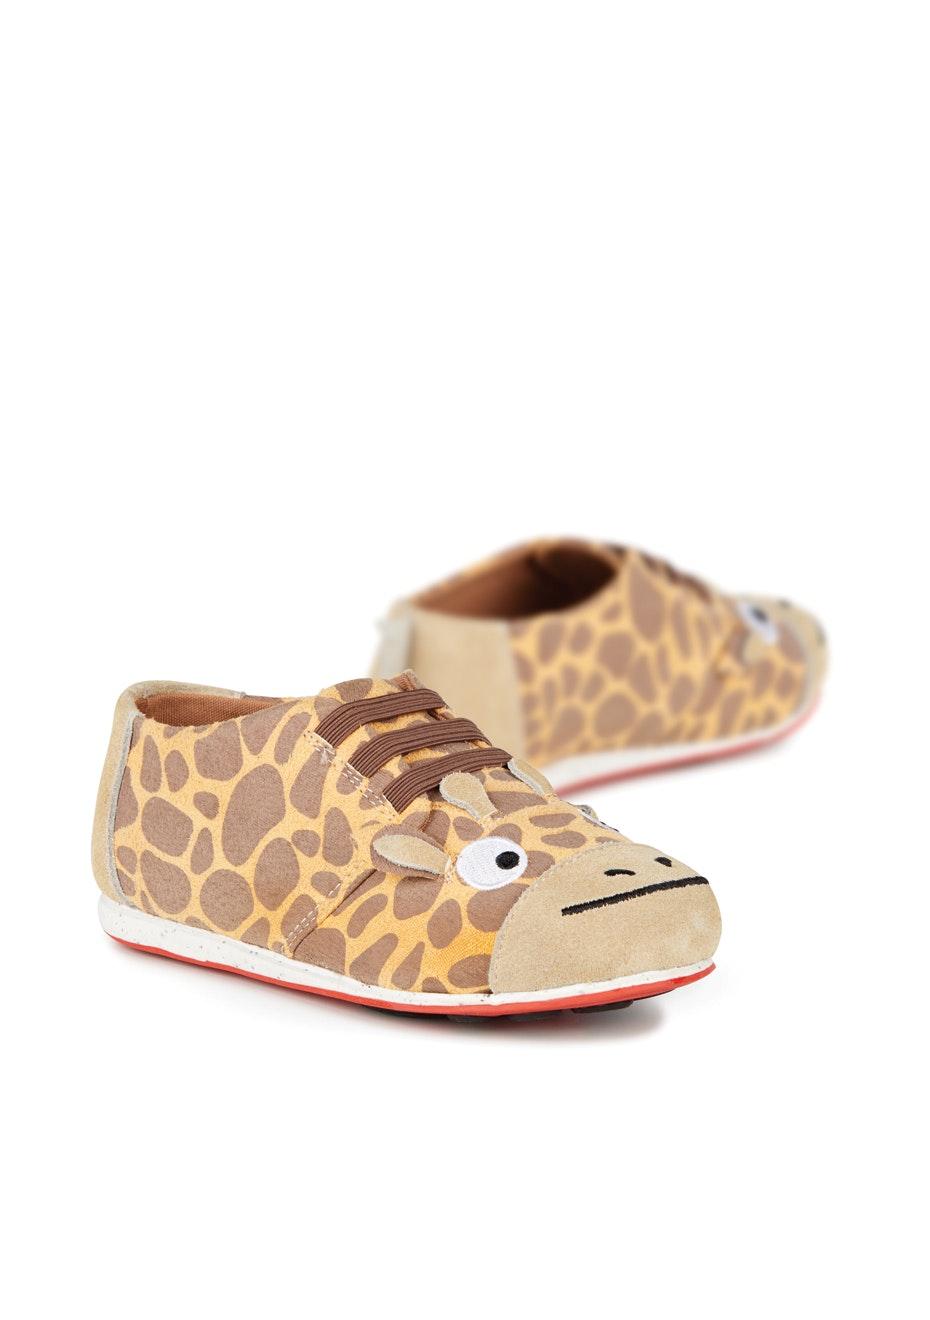 Emu - Giraffe Sneaker - Gold